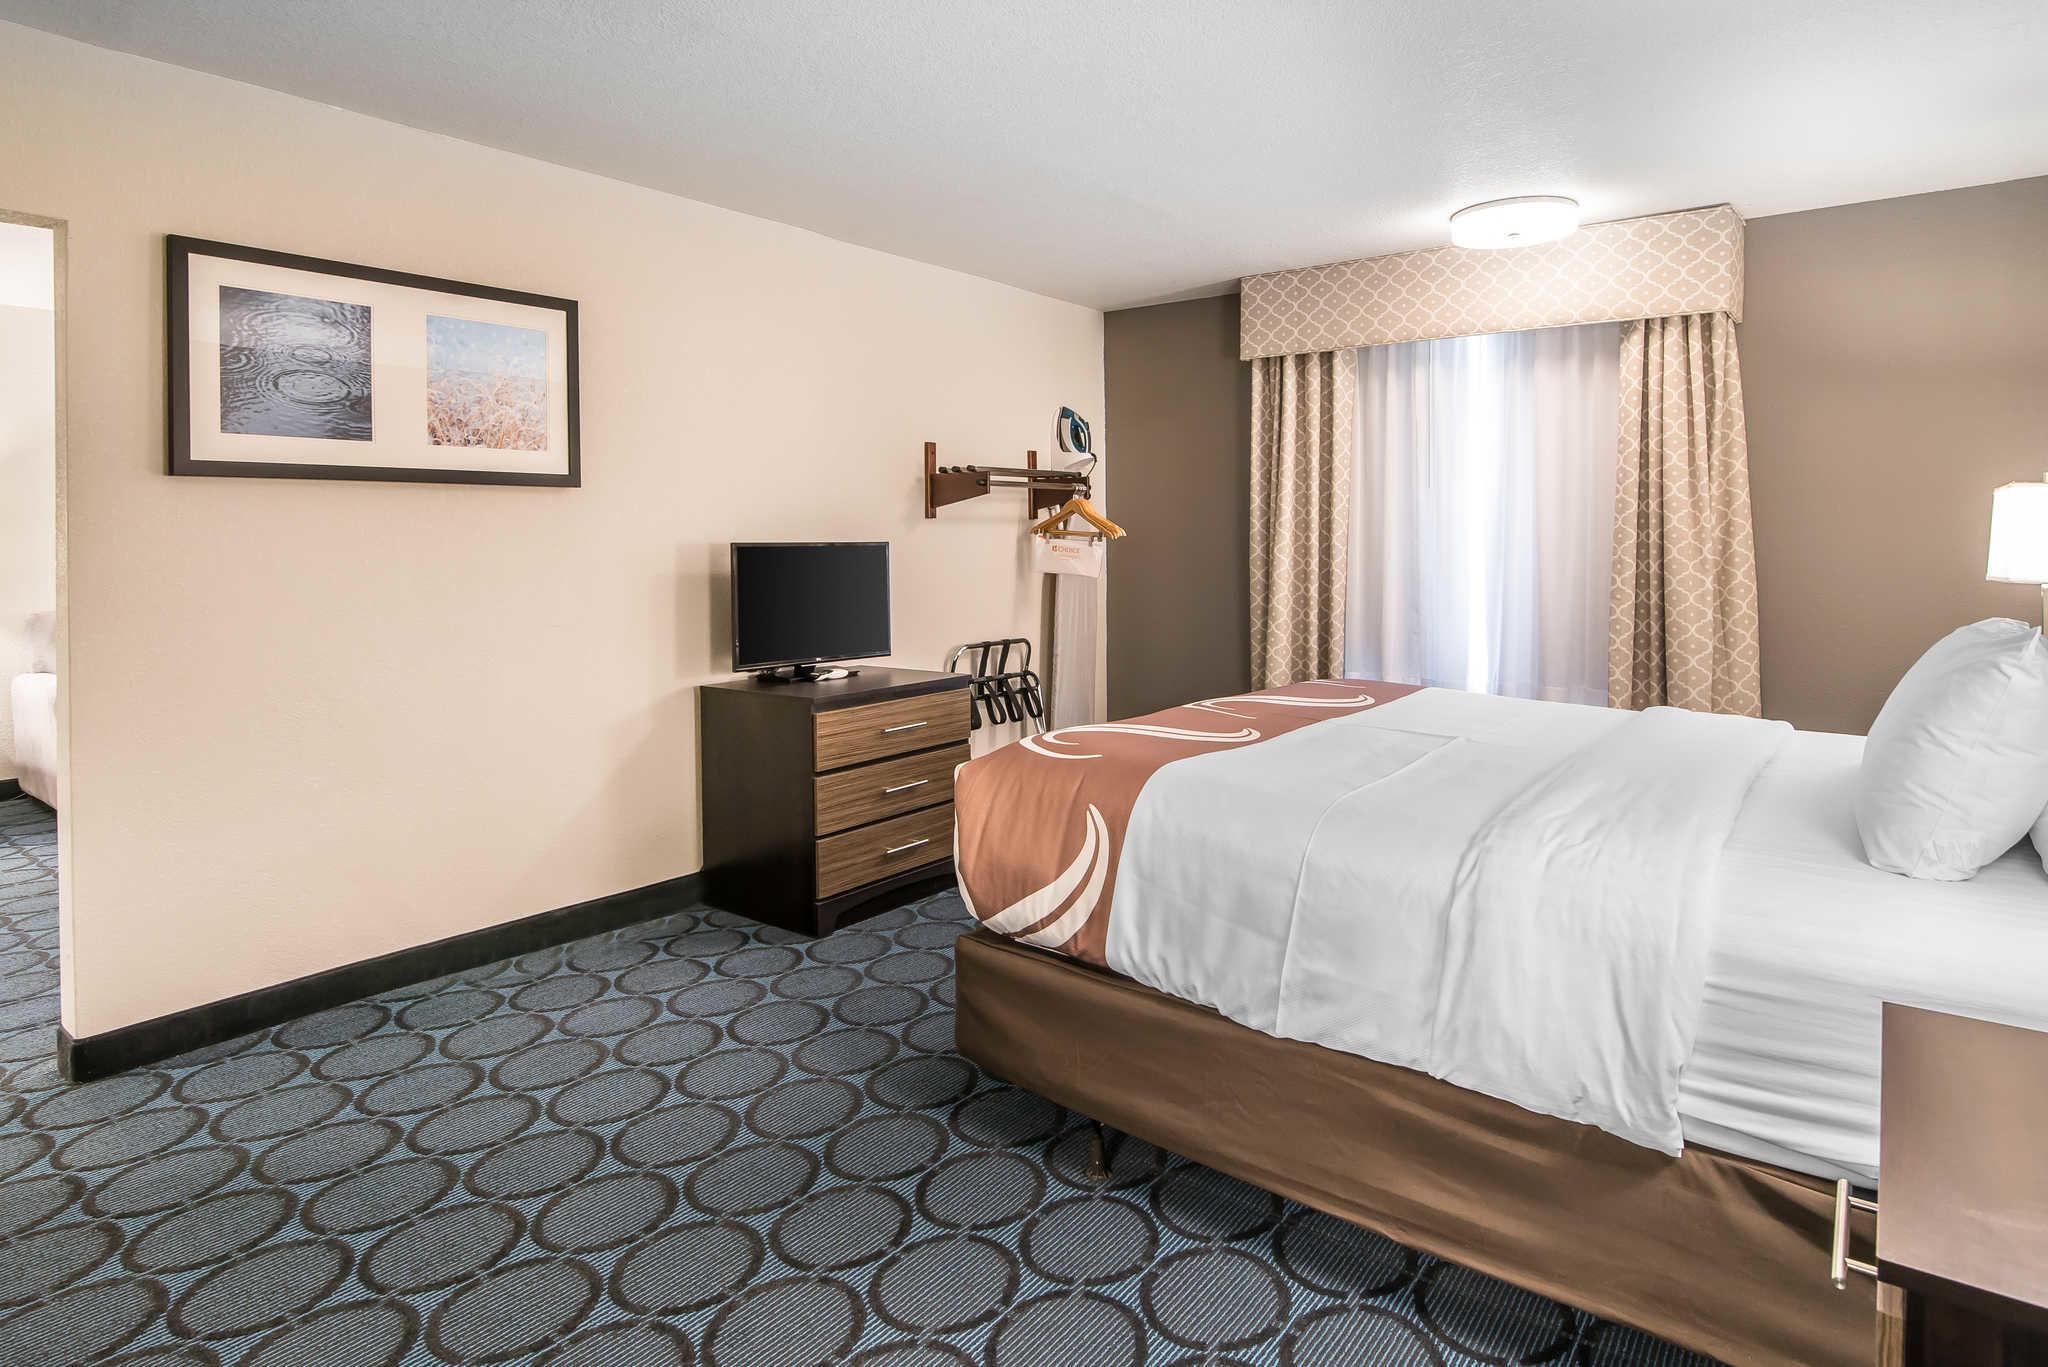 Quality Inn & Suites - Ruidoso Hwy 70 image 18